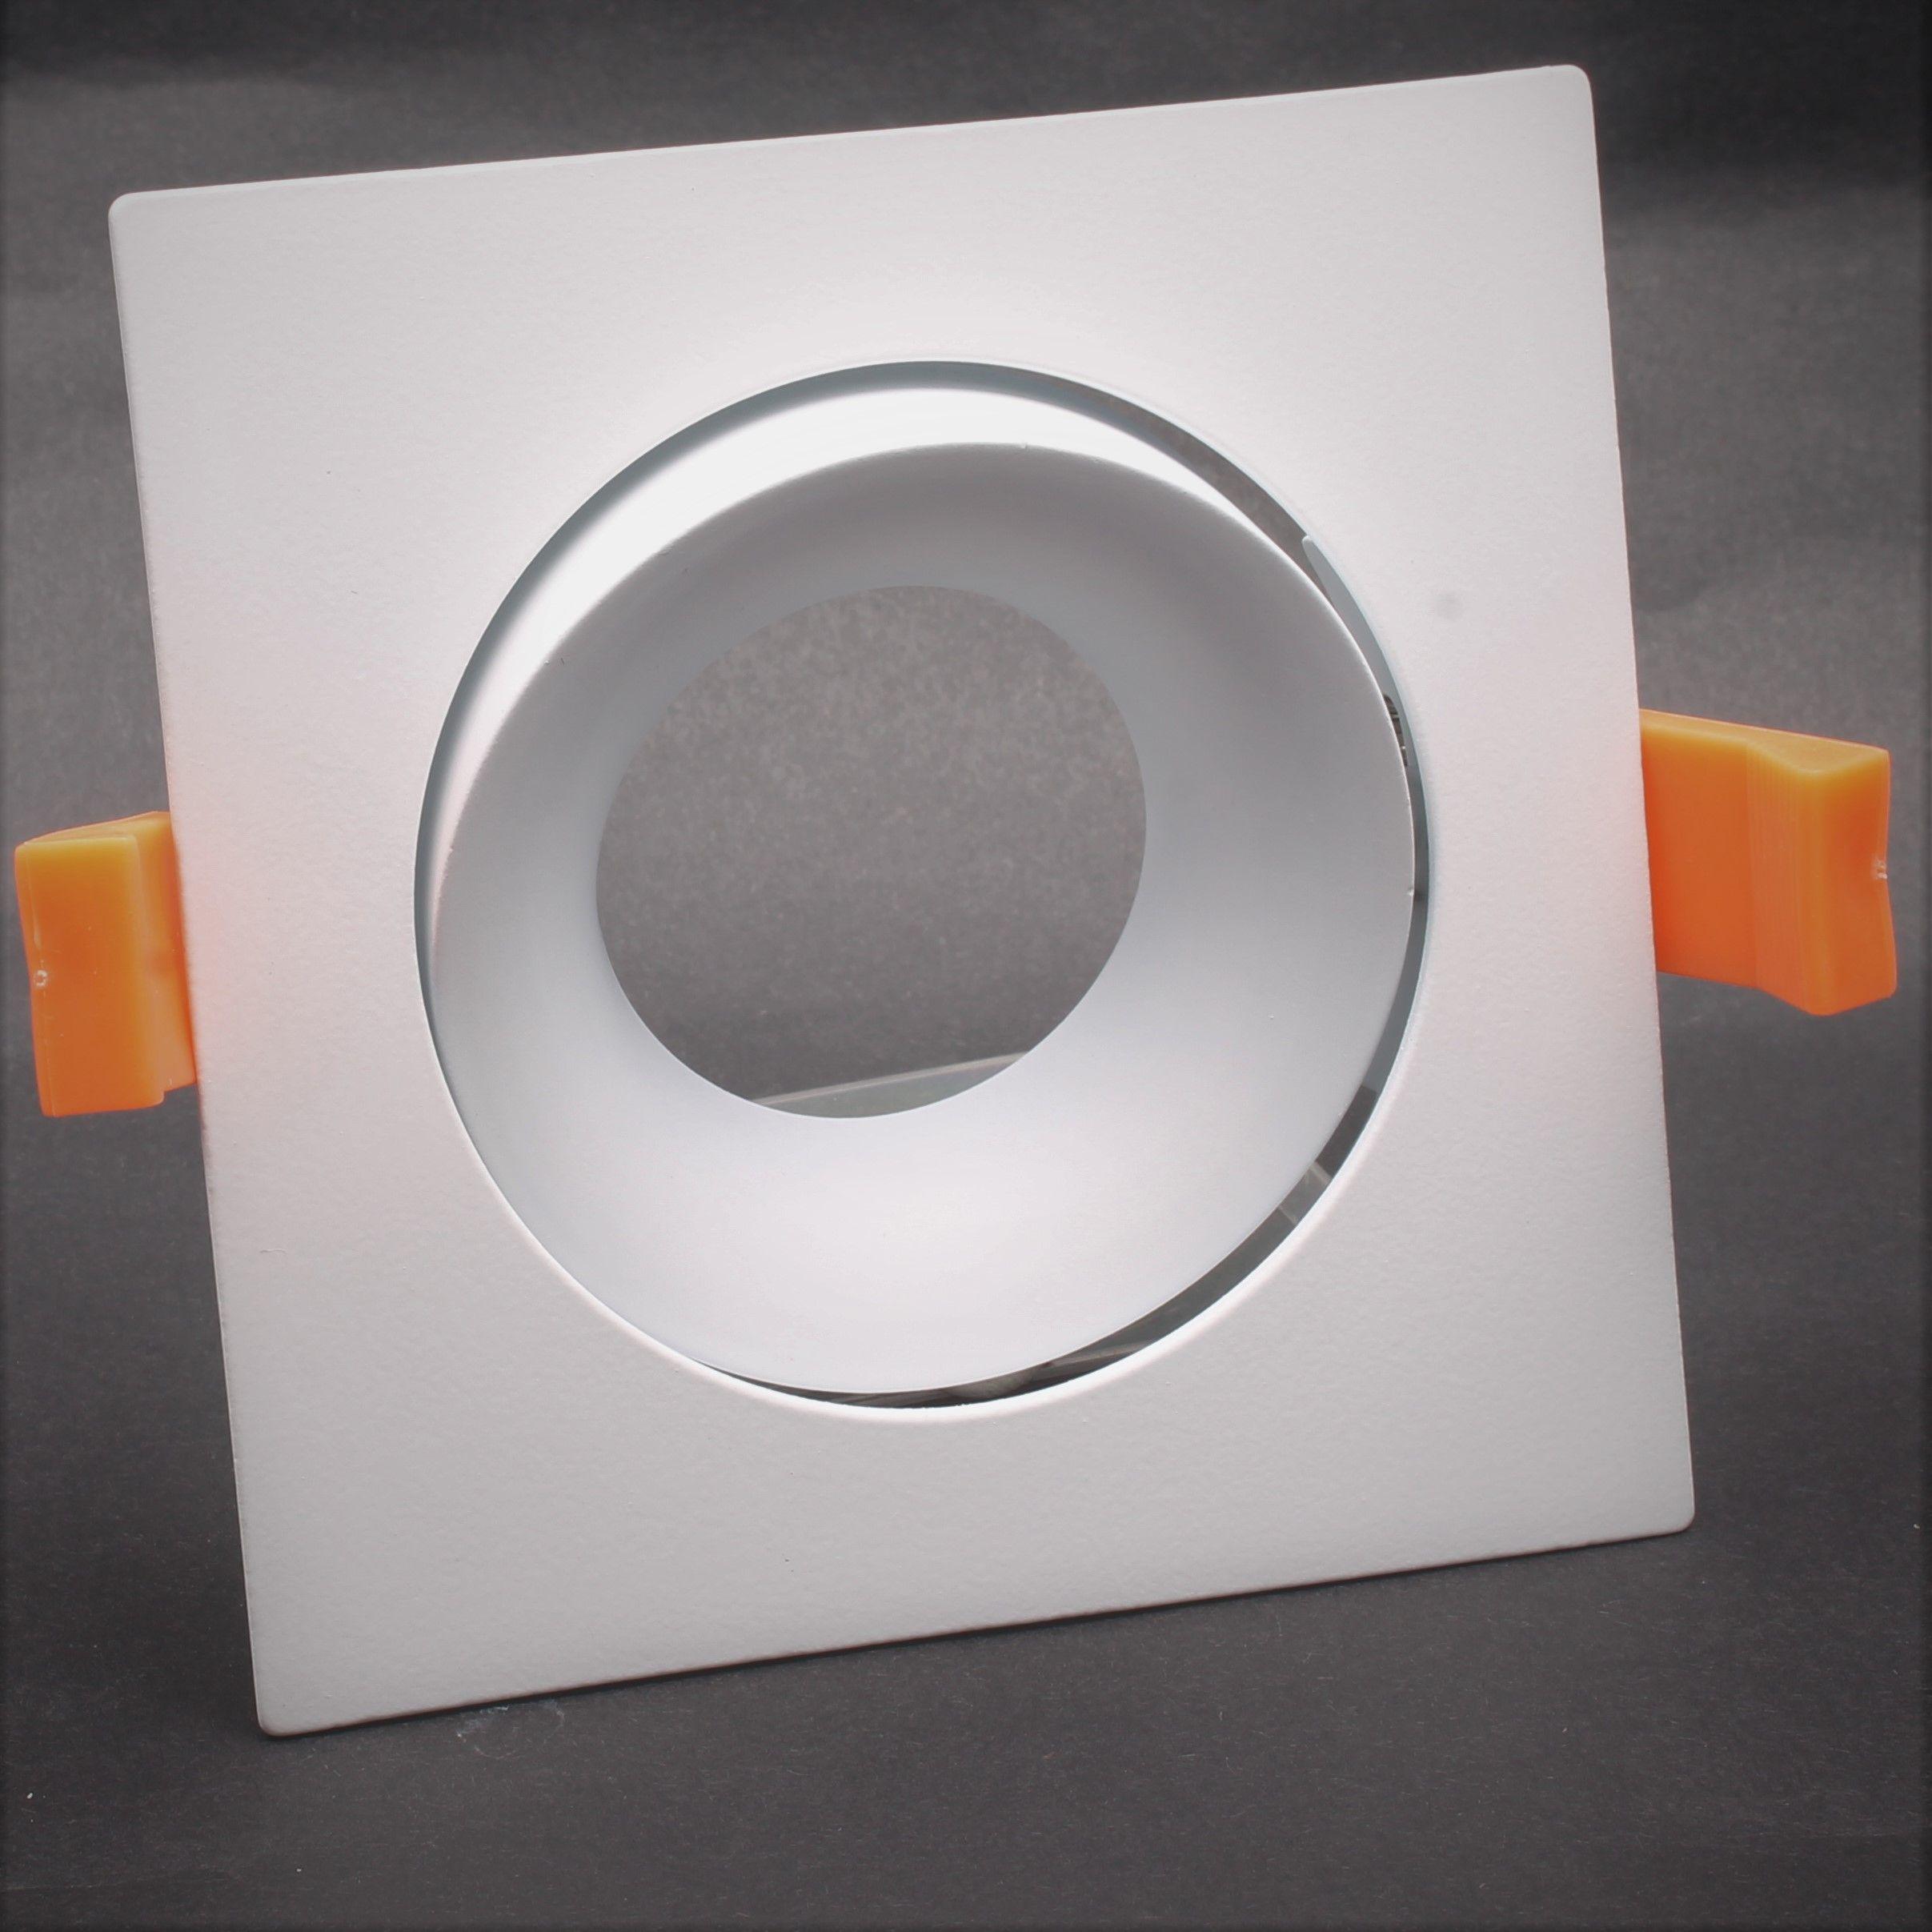 Inbouwring 103mm vierkant wit